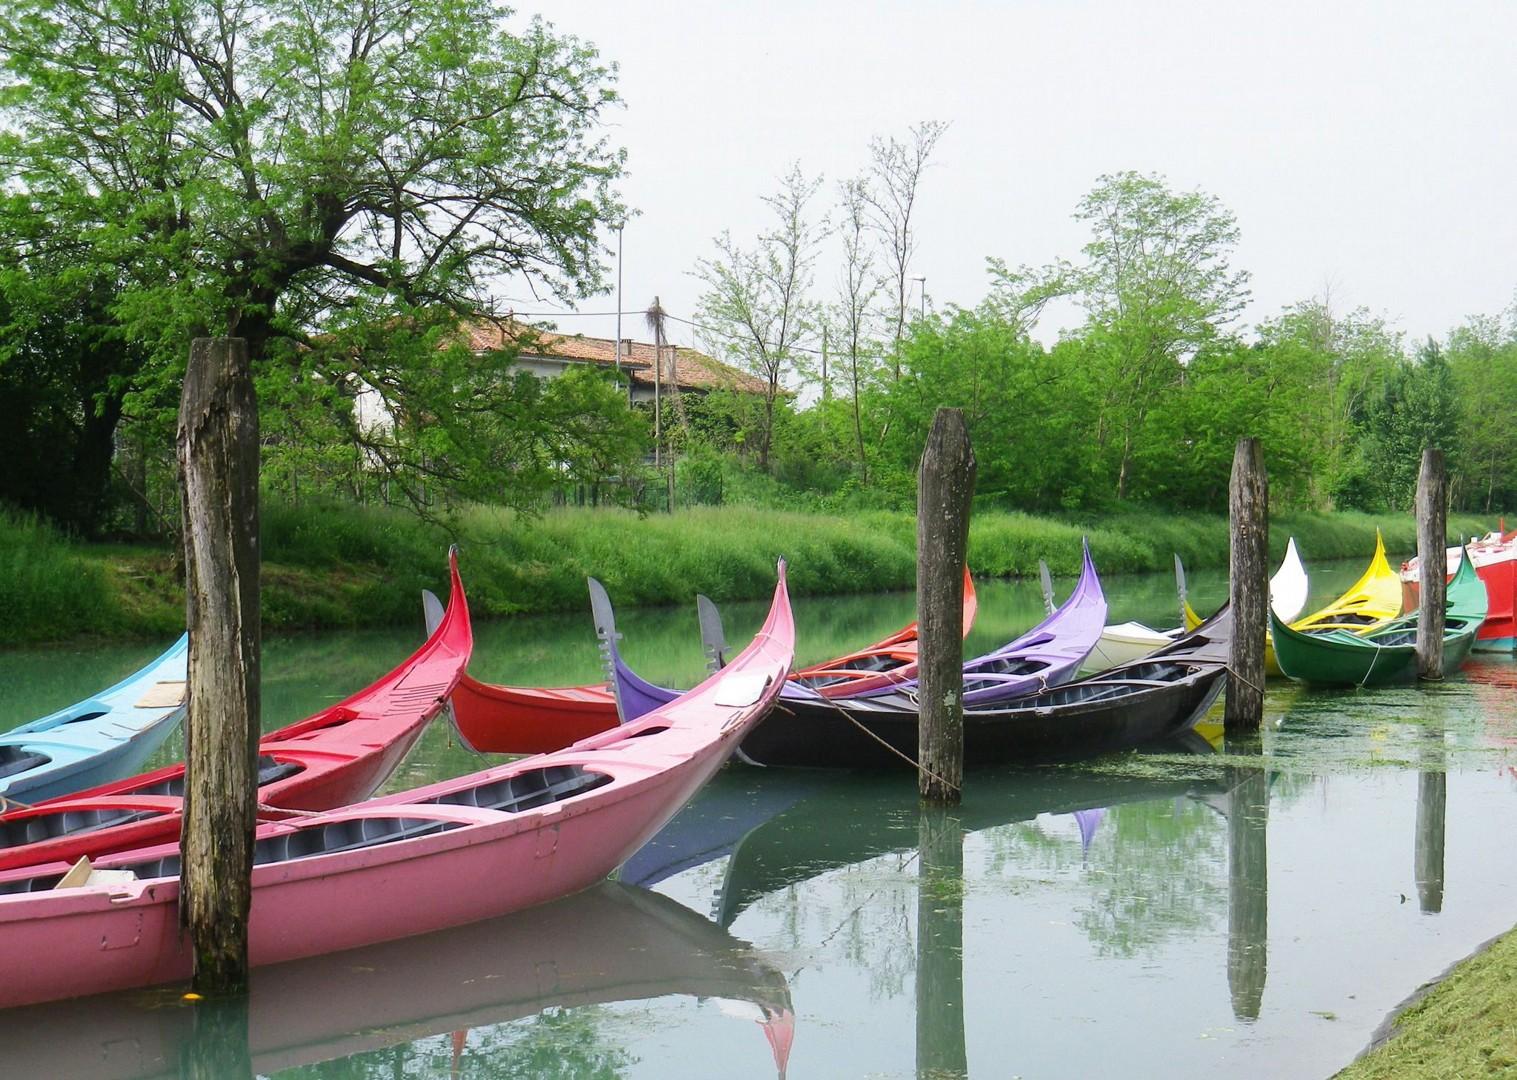 Family-Cycling-Holiday-Lake-Garda-Venice-Italy-gondola-Venice-canal.jpg - Italy - Lake Garda to Venice - Self-Guided Family Cycling Holiday - Italia Leisure and Family Cycling